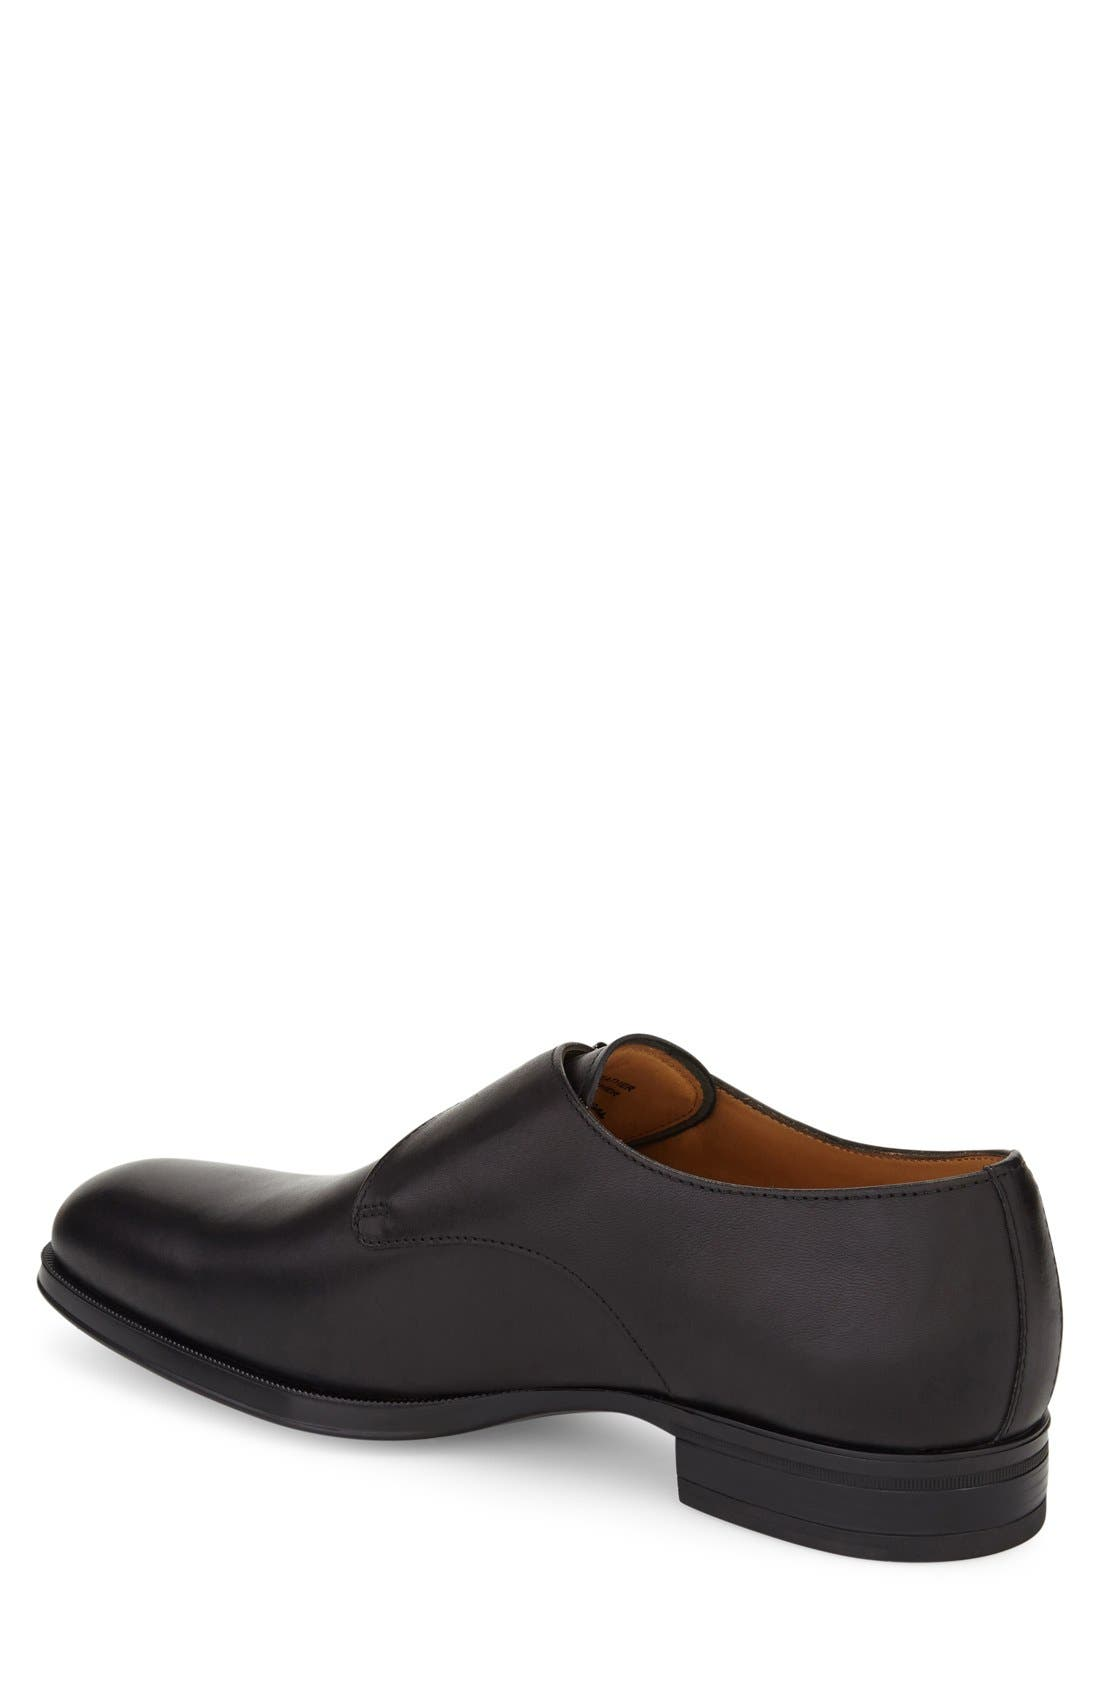 'Trifolo' Monk Strap Shoe,                             Alternate thumbnail 2, color,                             Black Leather